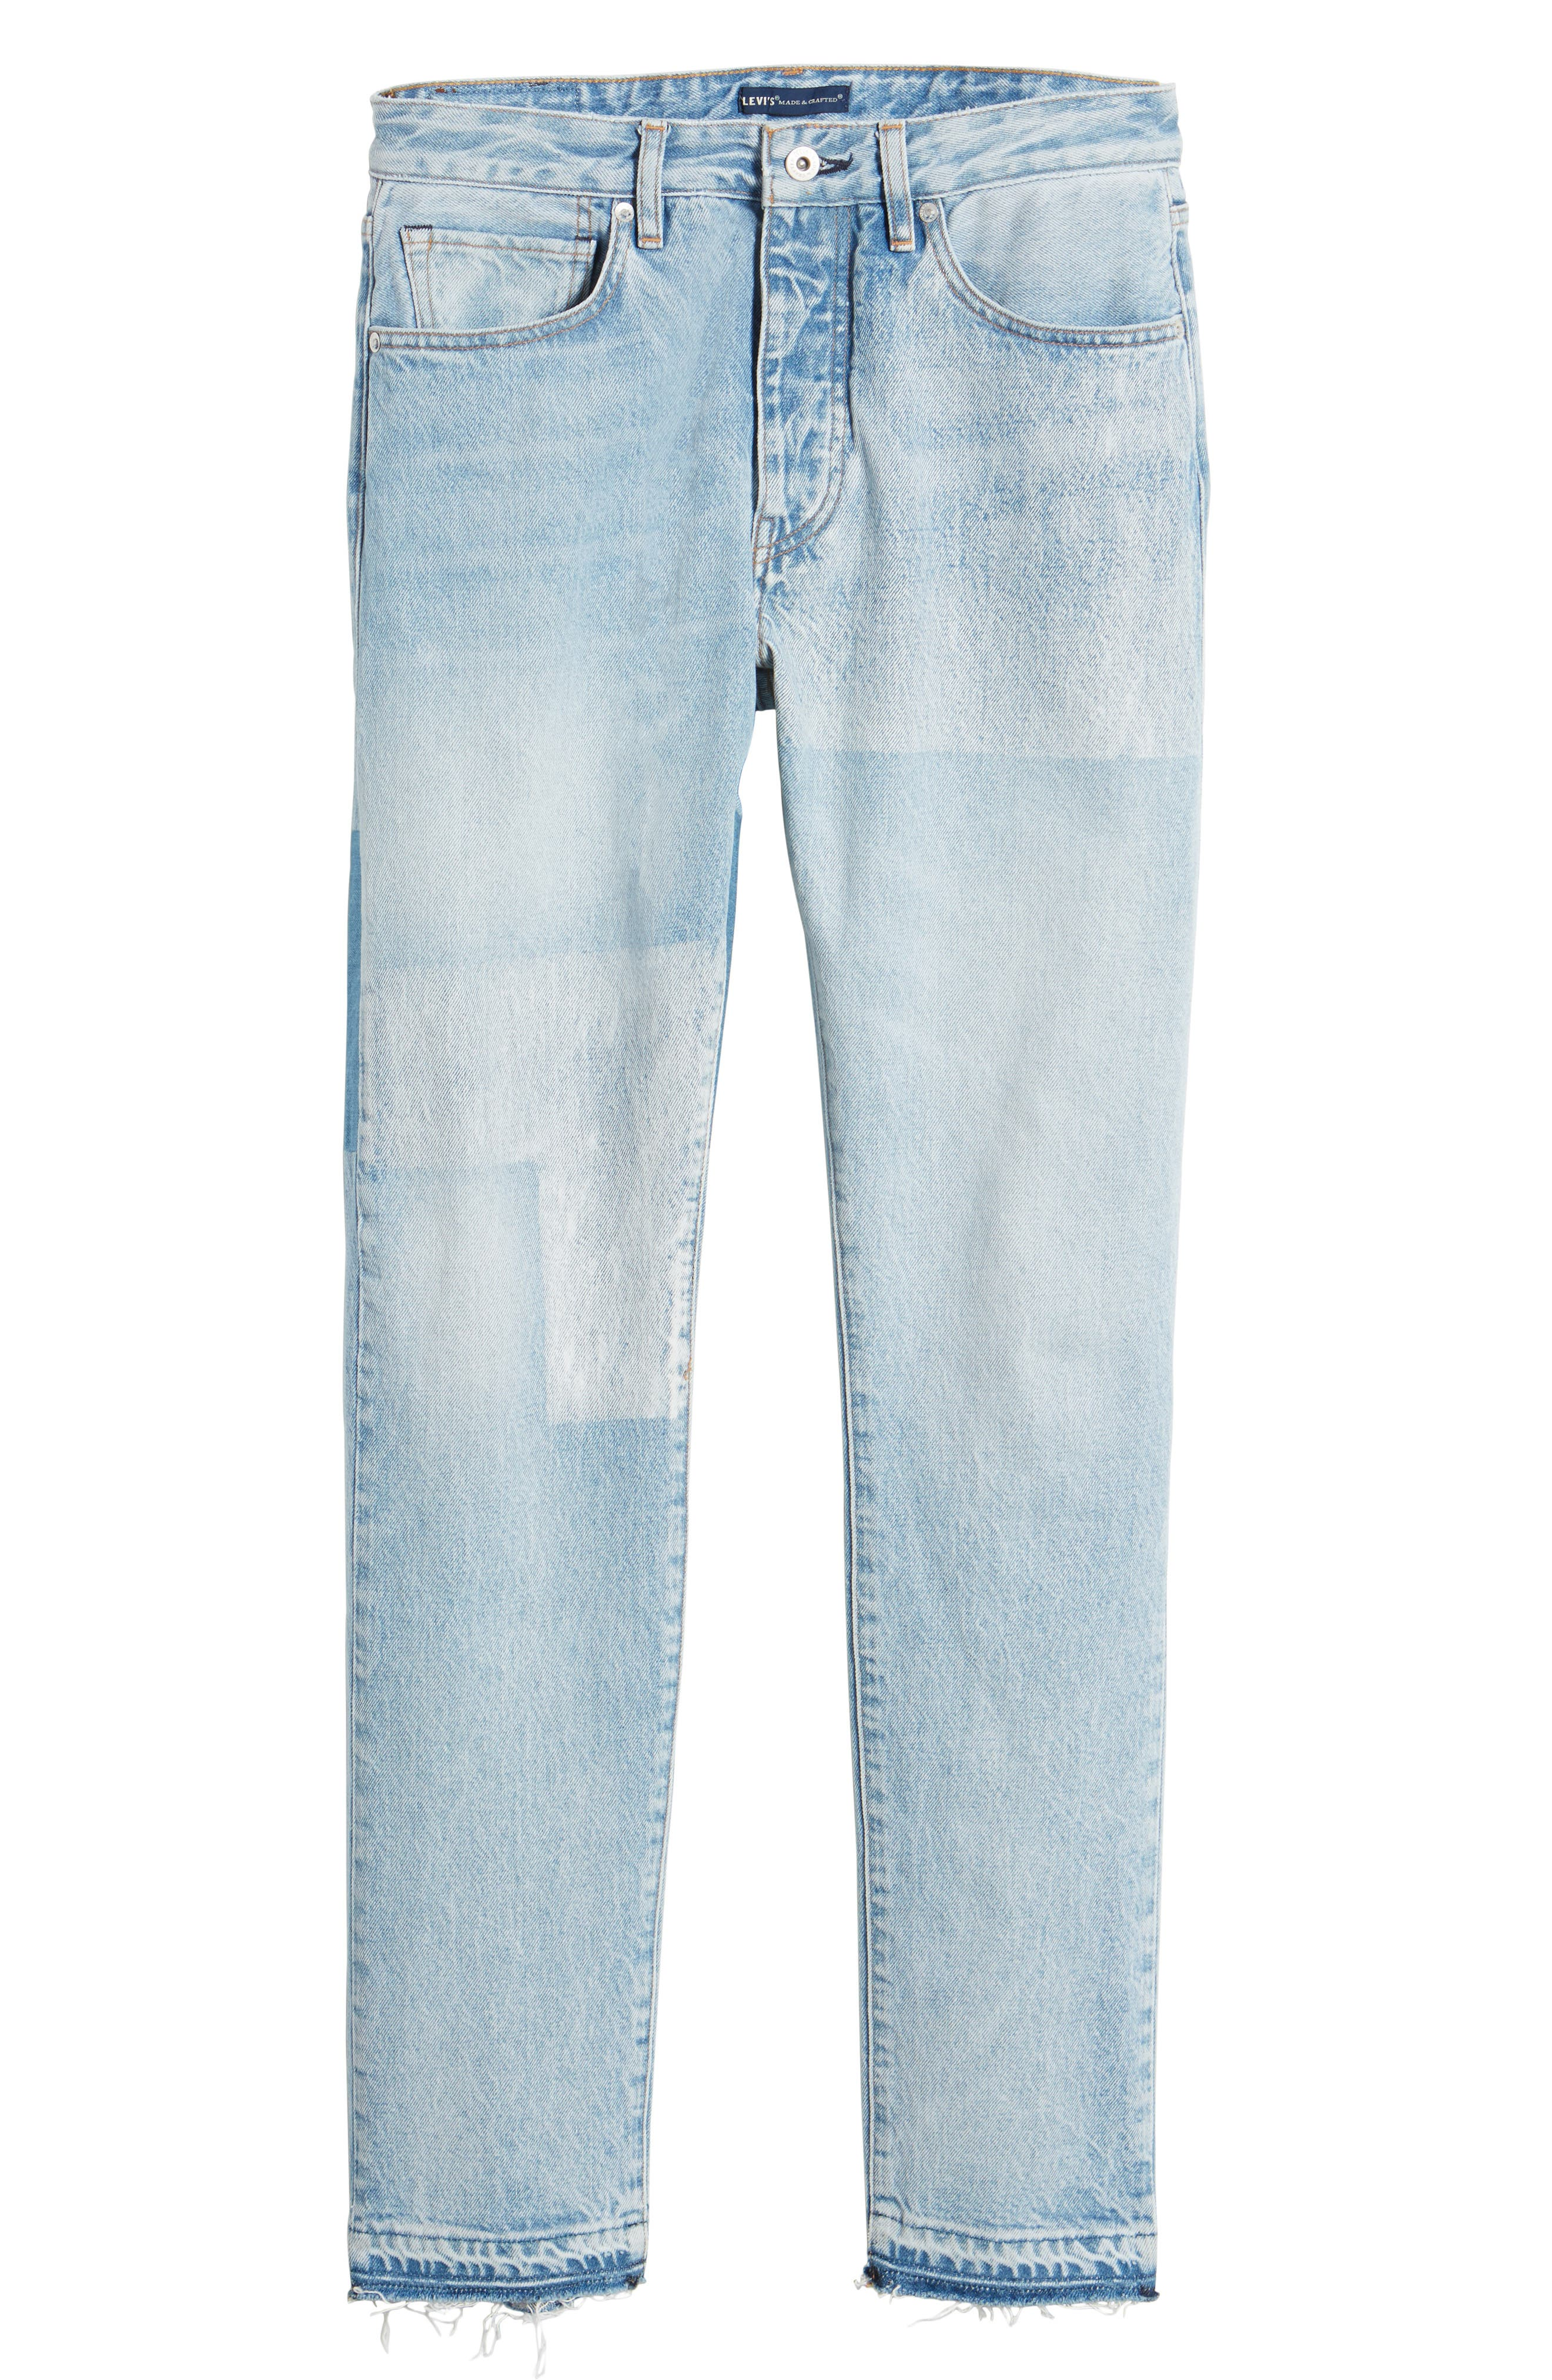 Studio Slim Fit Jeans,                             Alternate thumbnail 6, color,                             420